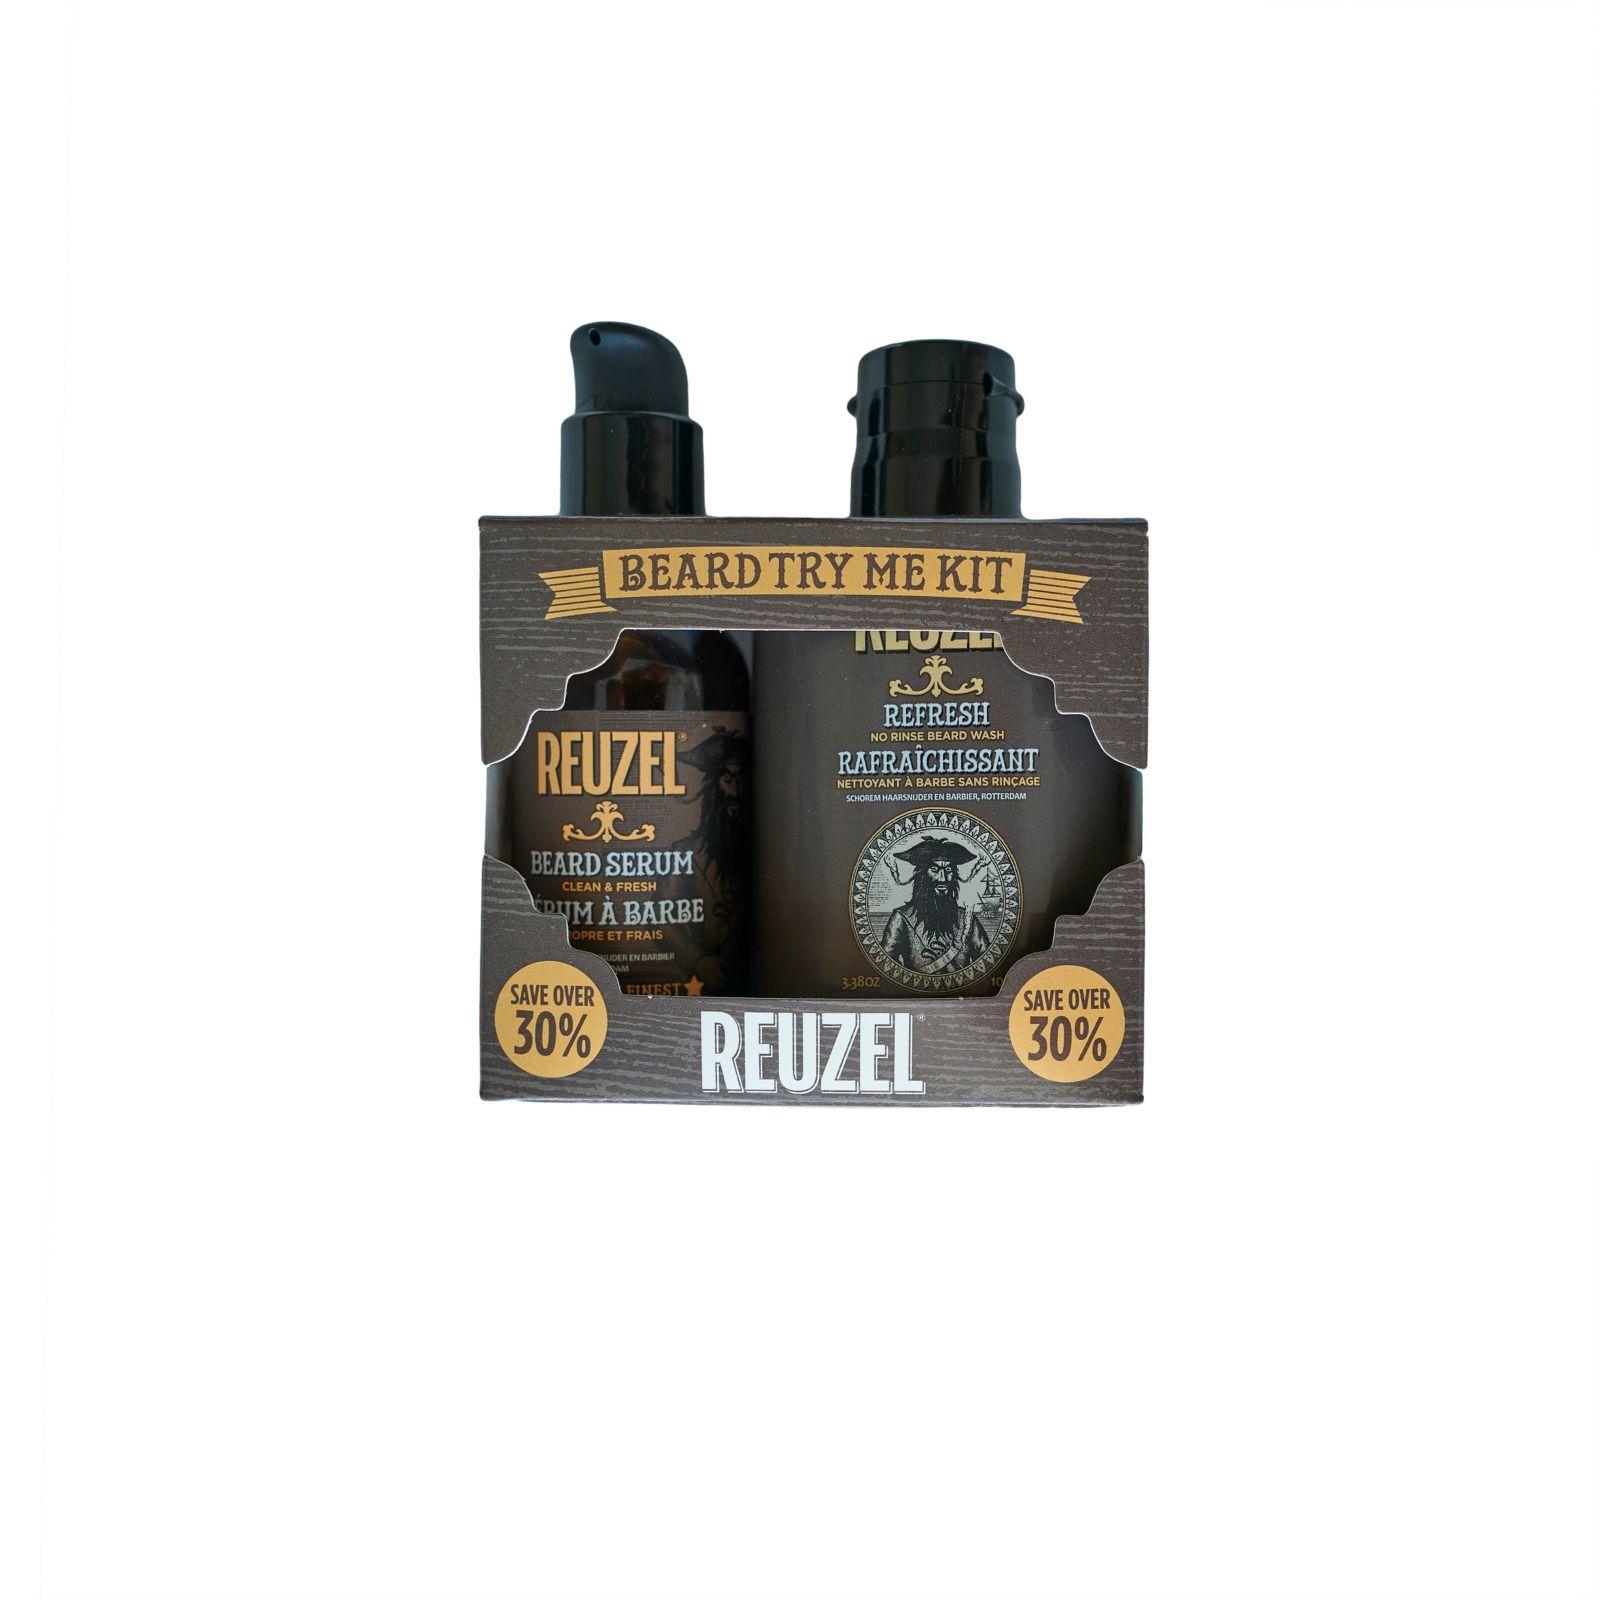 Tuotekuva: Reuzel Clean & Fresh Try Me Kit -Beard Wash & Serum